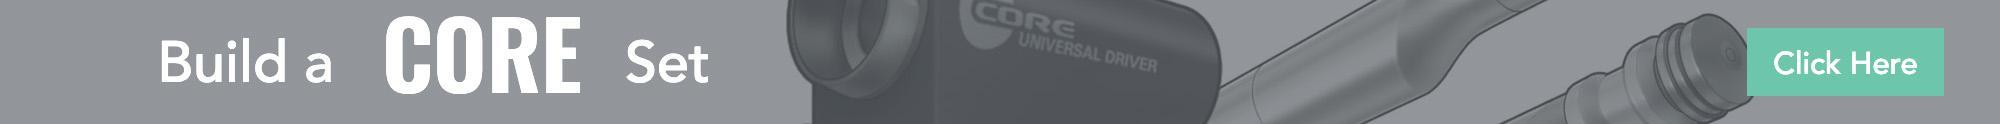 Stryker CORE Universal Driver